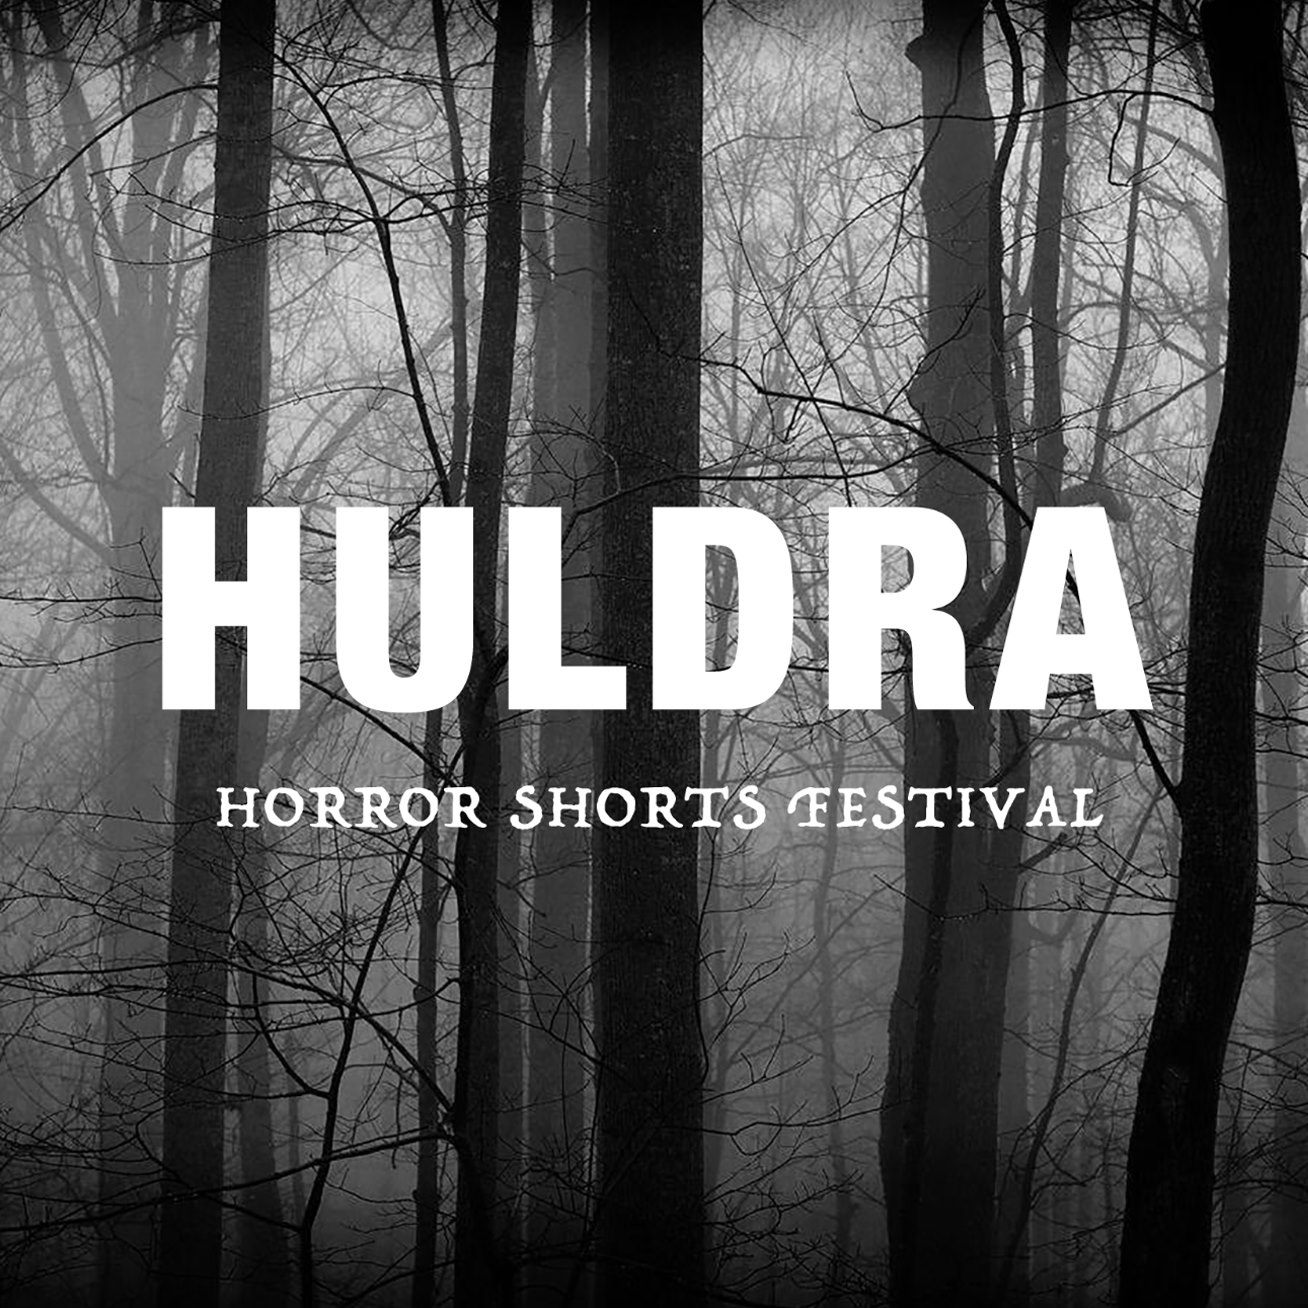 huldra - horror film festival - 2021 - nottingham - sunset cinema club - notts maze - nottingham